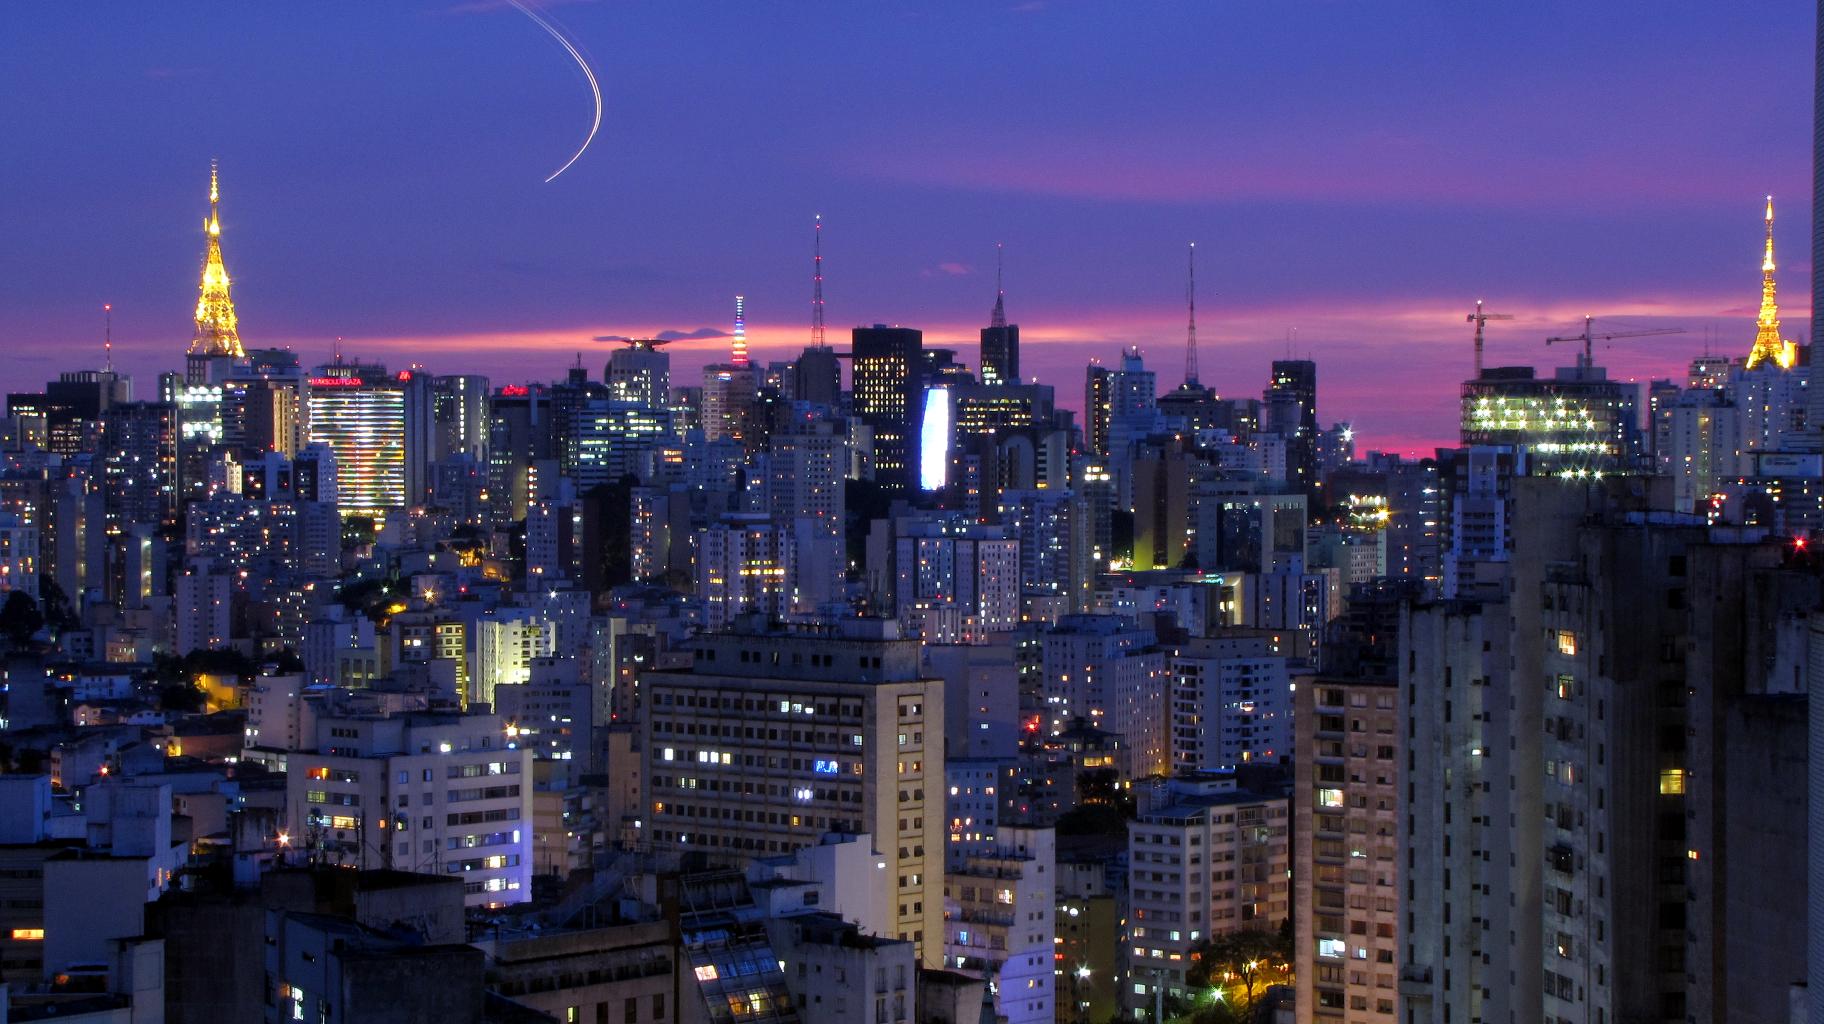 The Sao Paulo cityscape at sunset. Photo:  Copan